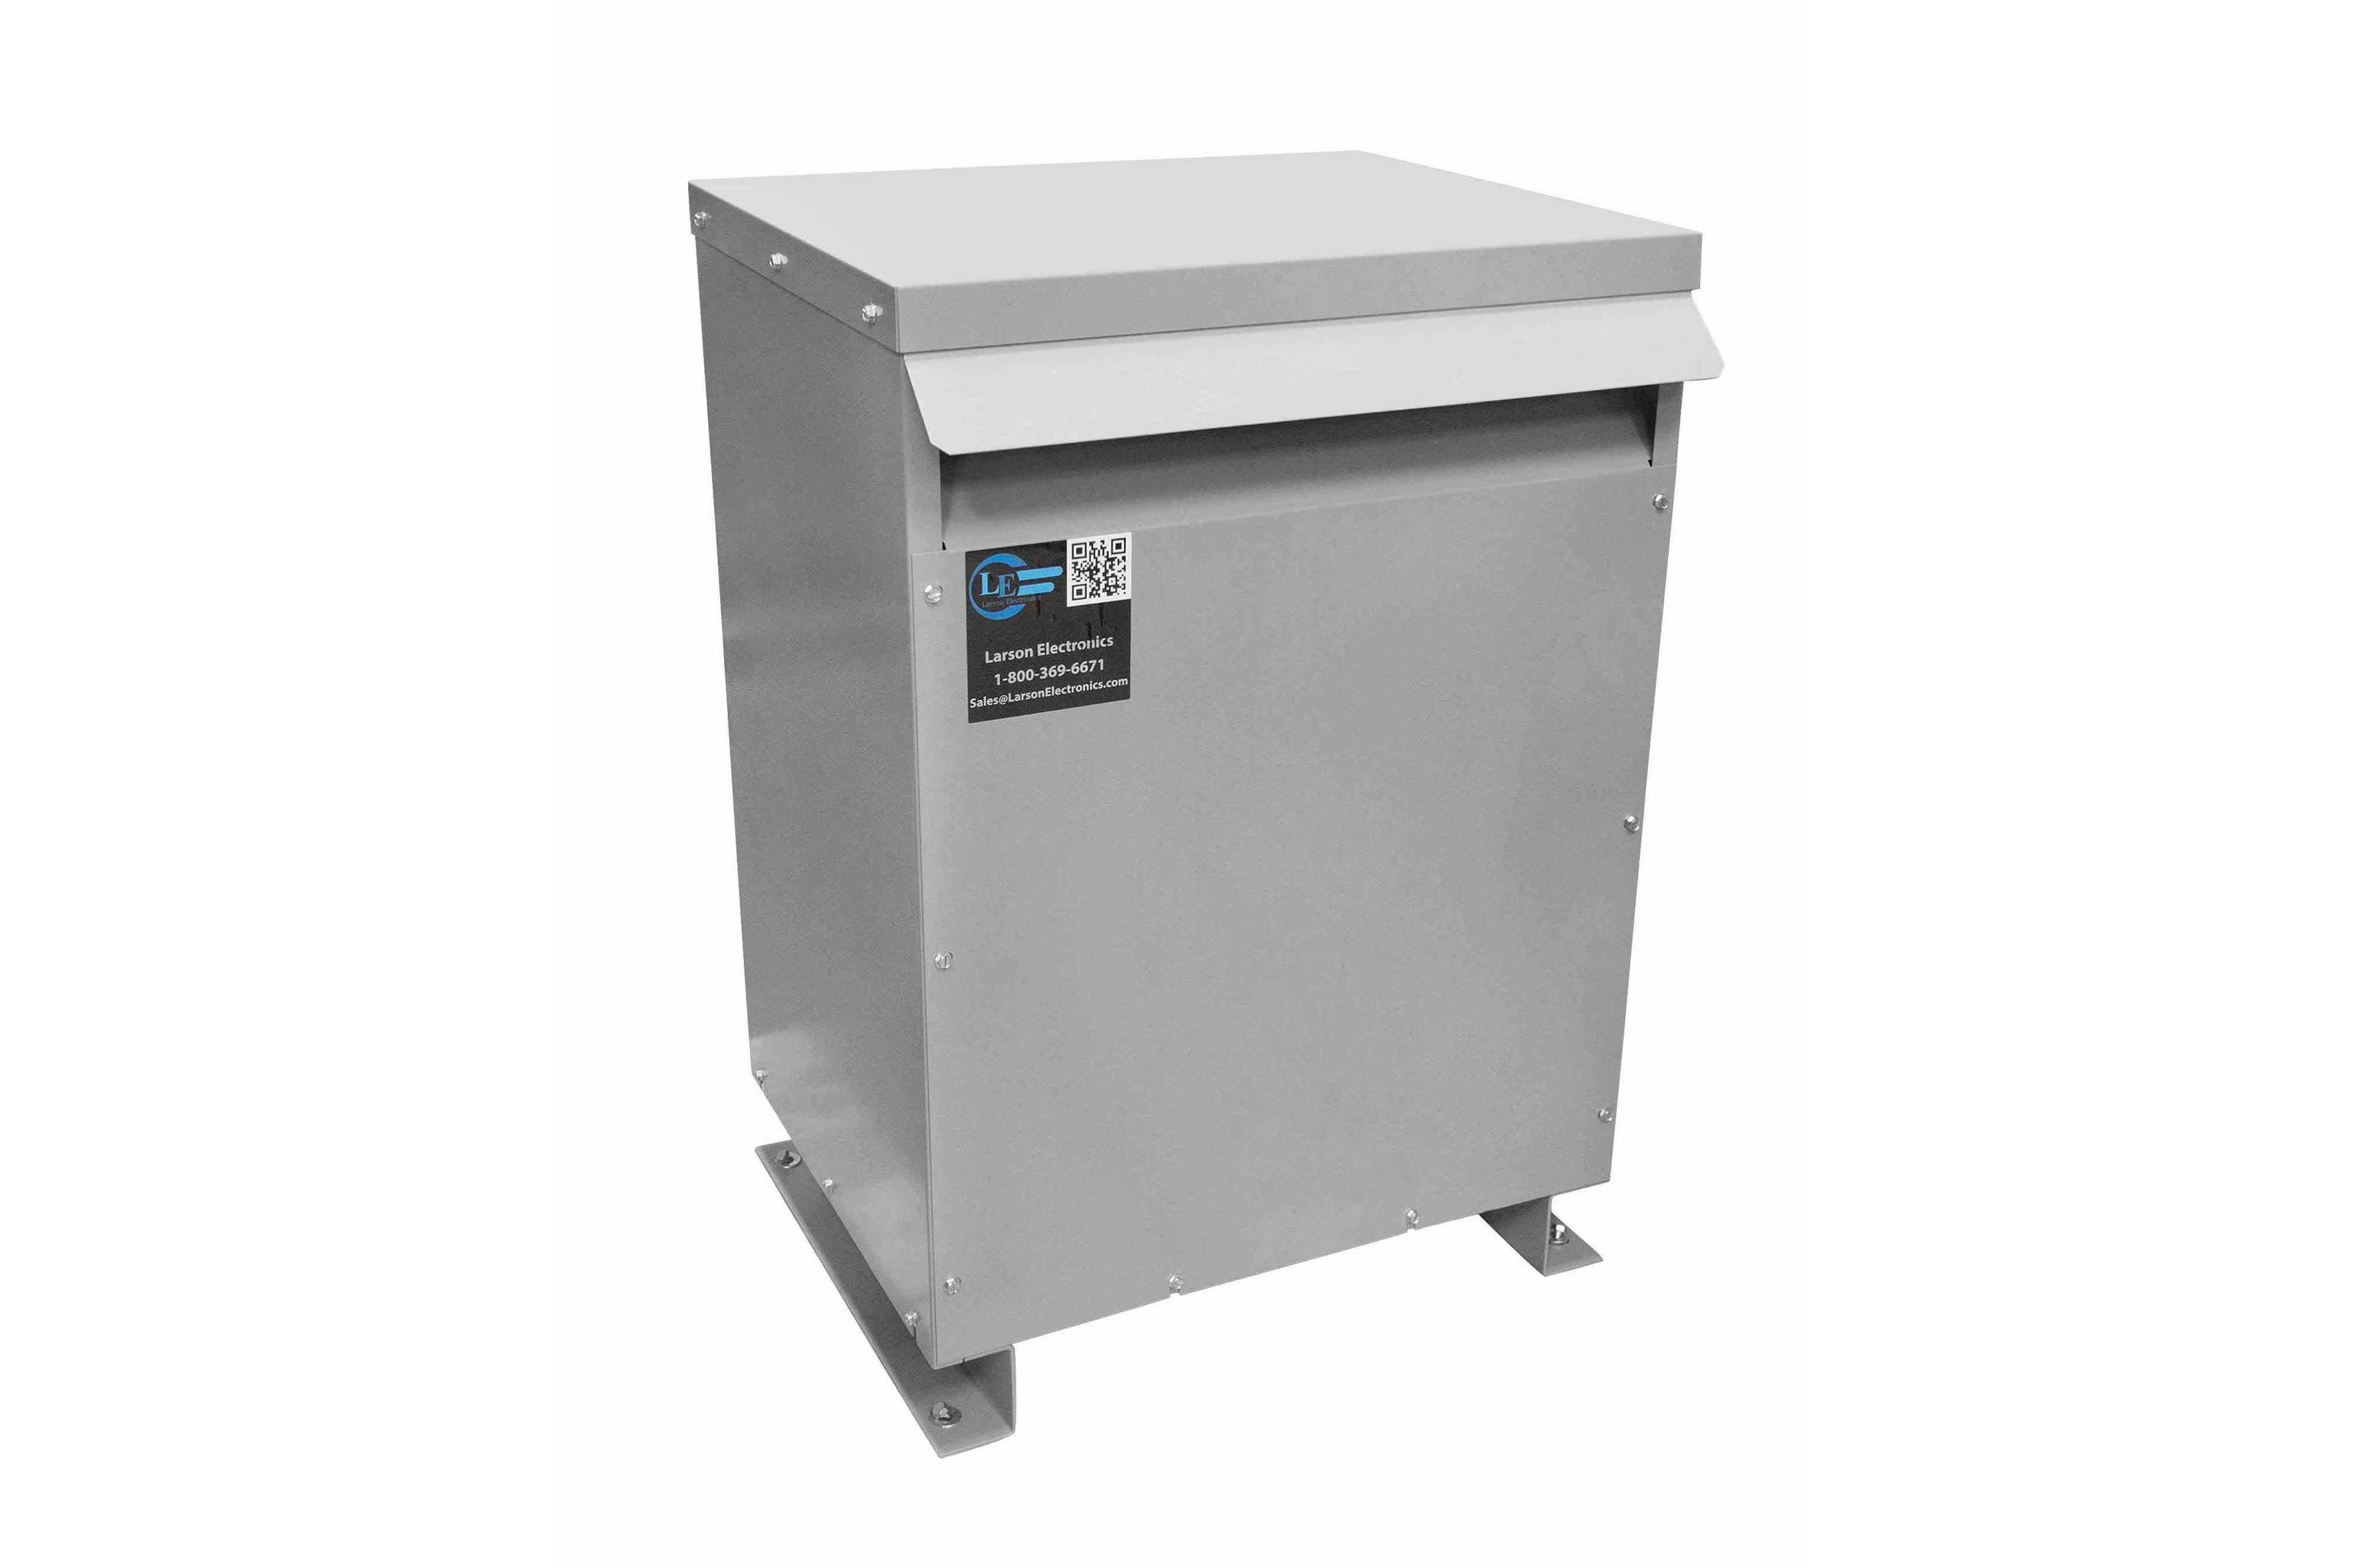 150 kVA 3PH Isolation Transformer, 208V Wye Primary, 208V Delta Secondary, N3R, Ventilated, 60 Hz